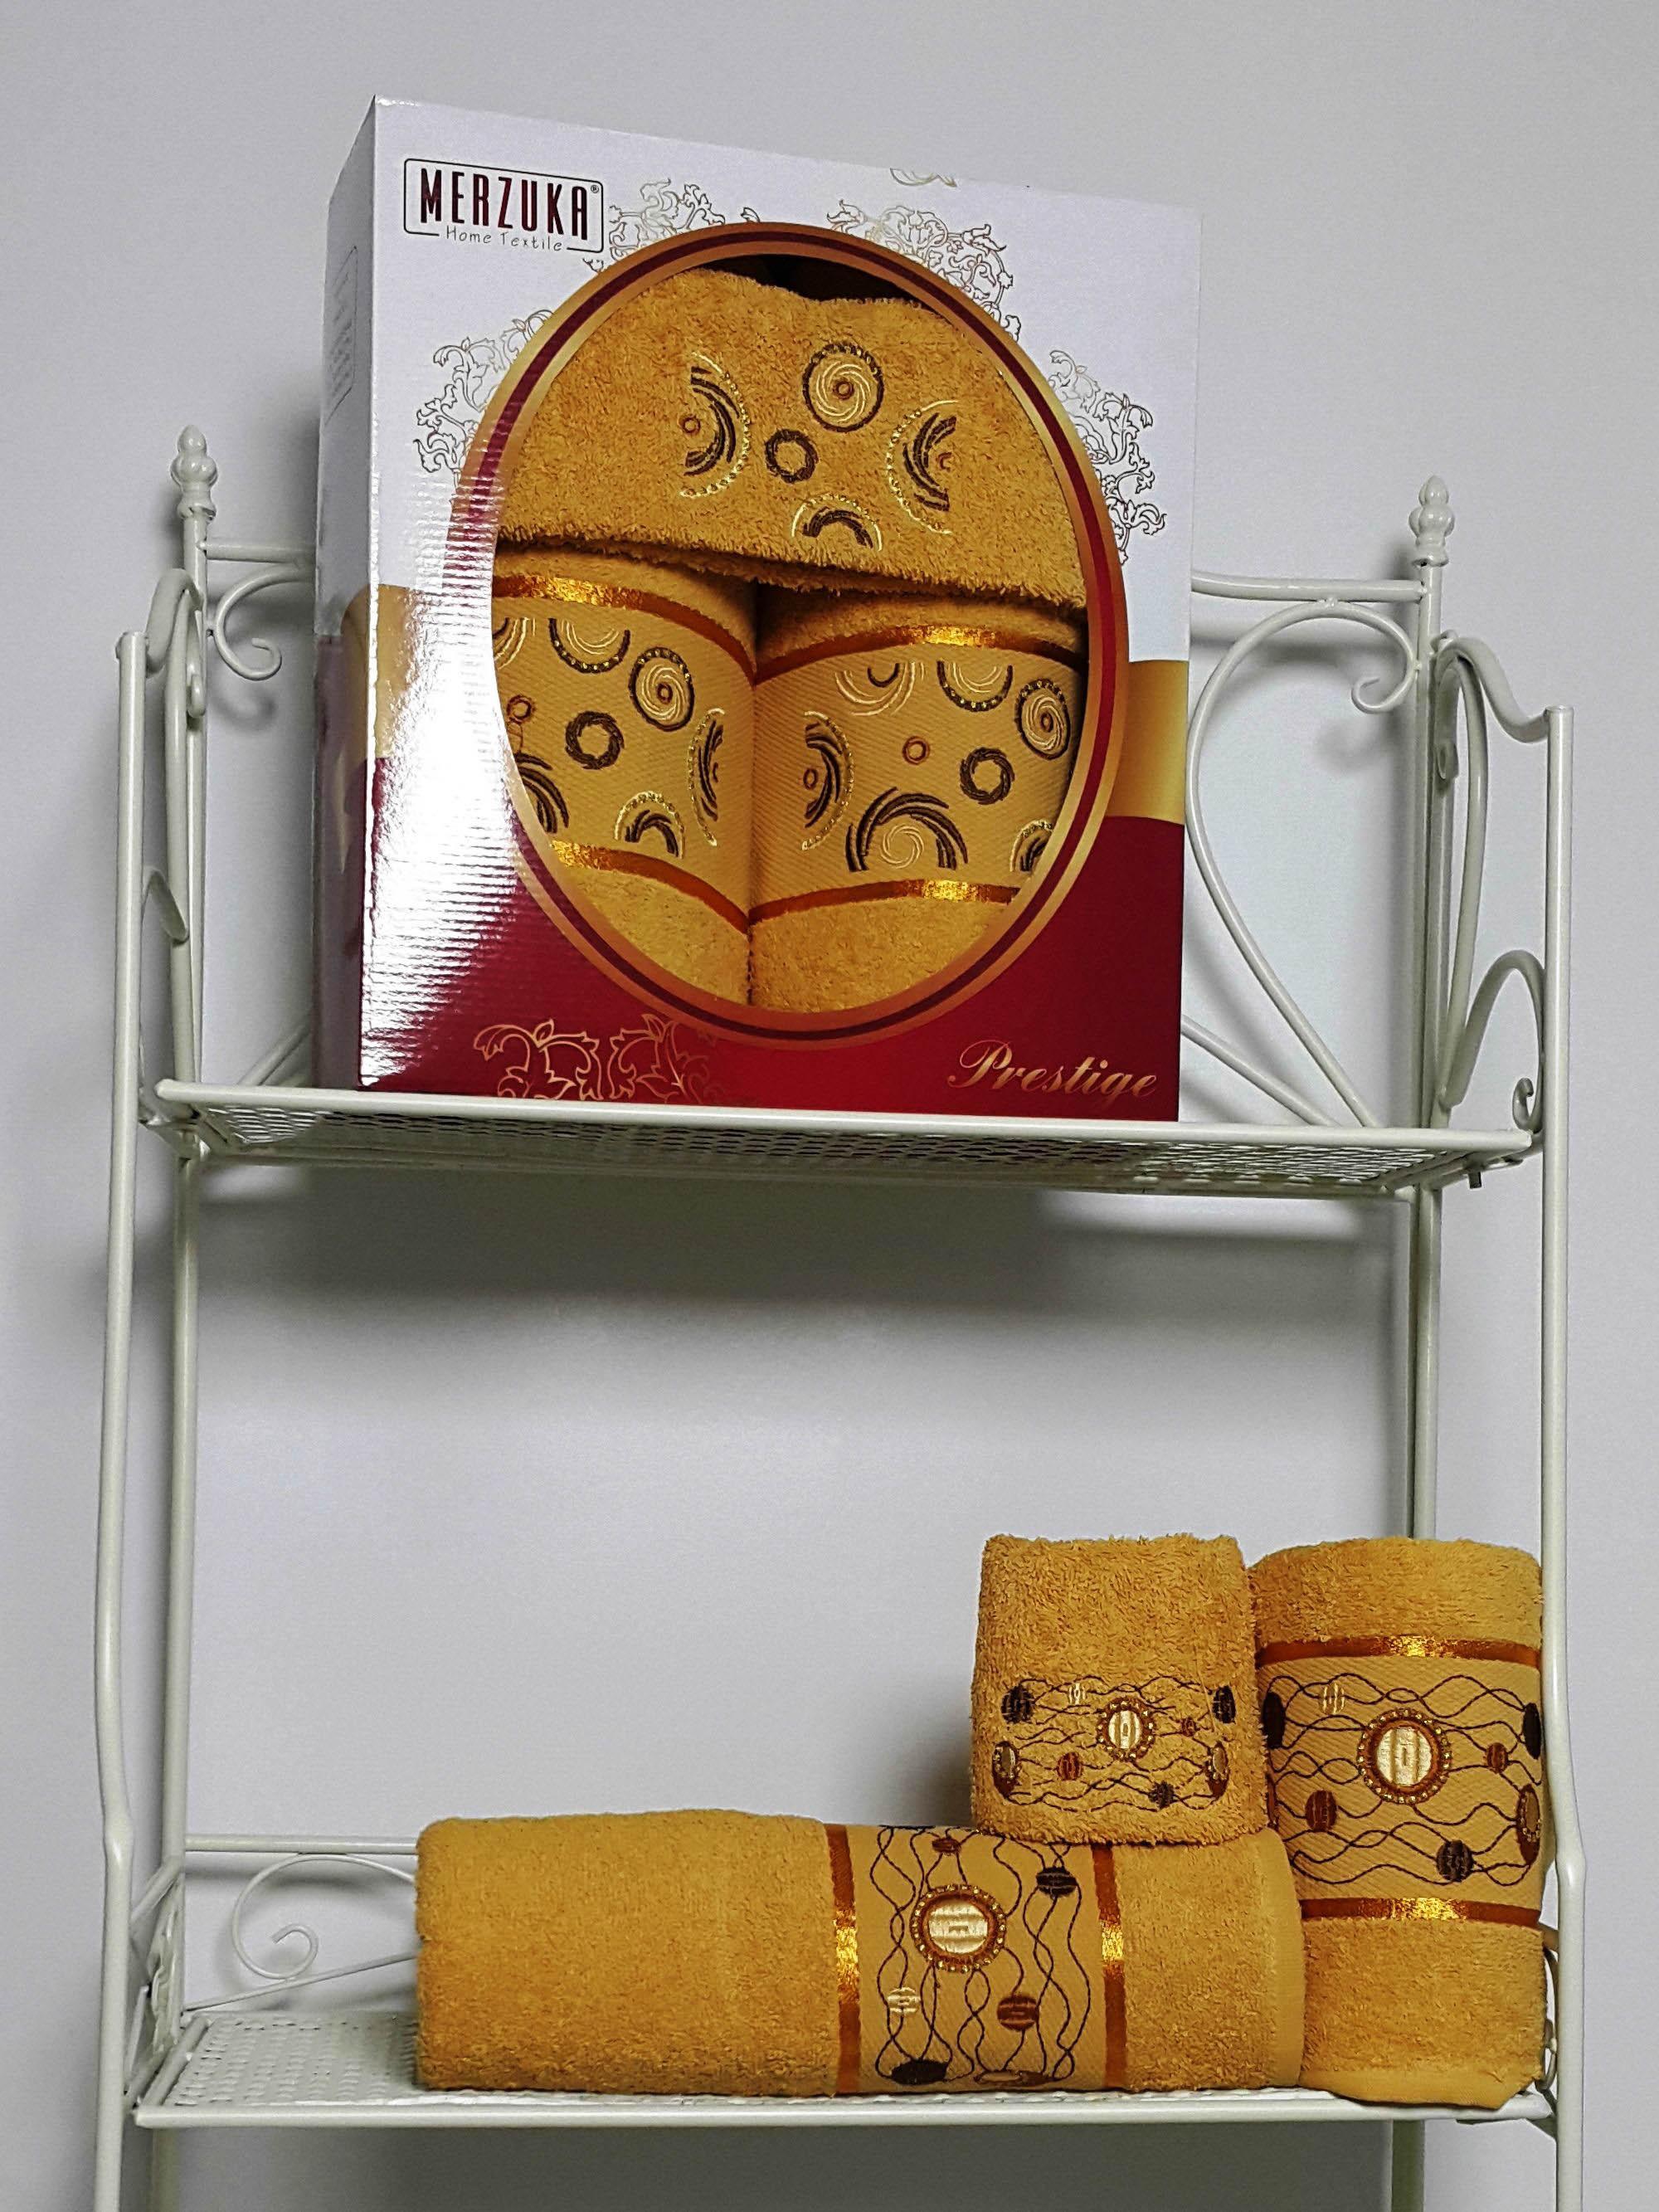 Полотенца Oran Merzuka Набор из 3 полотенец Prestij Цвет: Горчичный набор из 3 полотенец merzuka sakura 50х90 2 70х140 8432 оранжевый